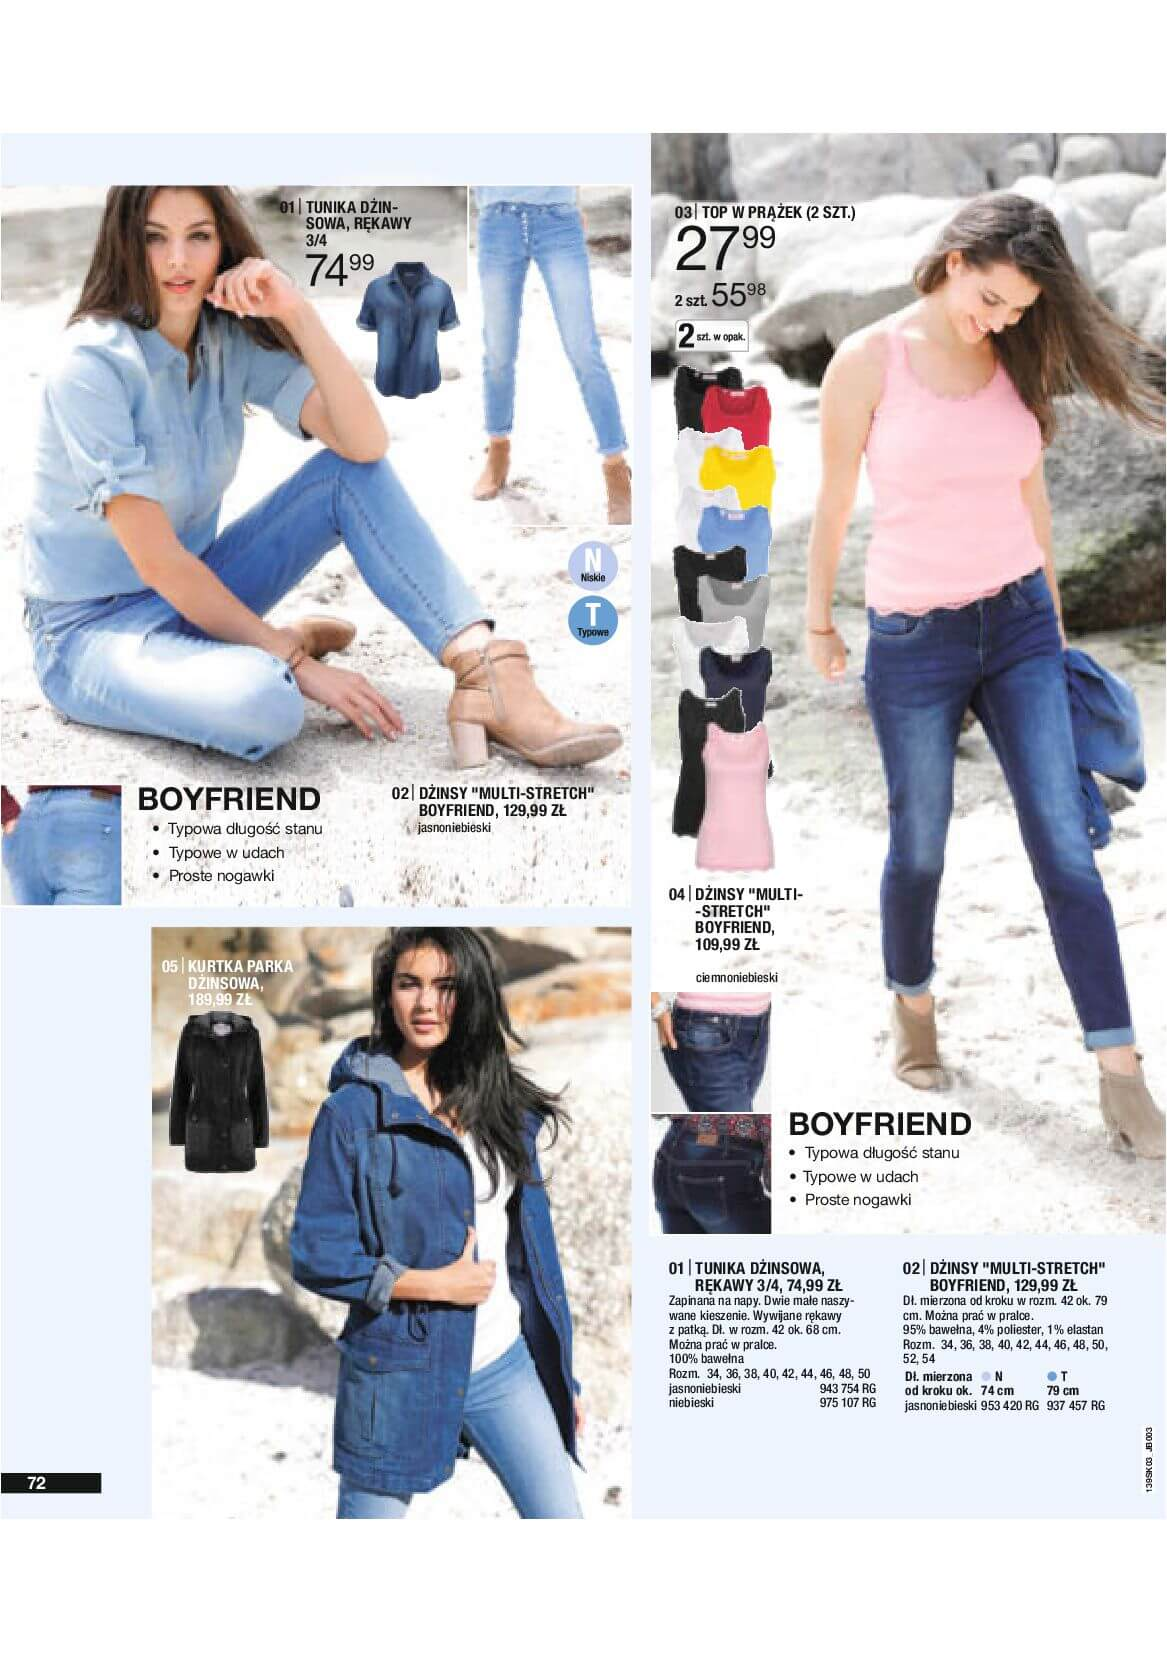 Gazetka Bonprix - Radosna moda-10.03.2019-25.06.2019-page-74